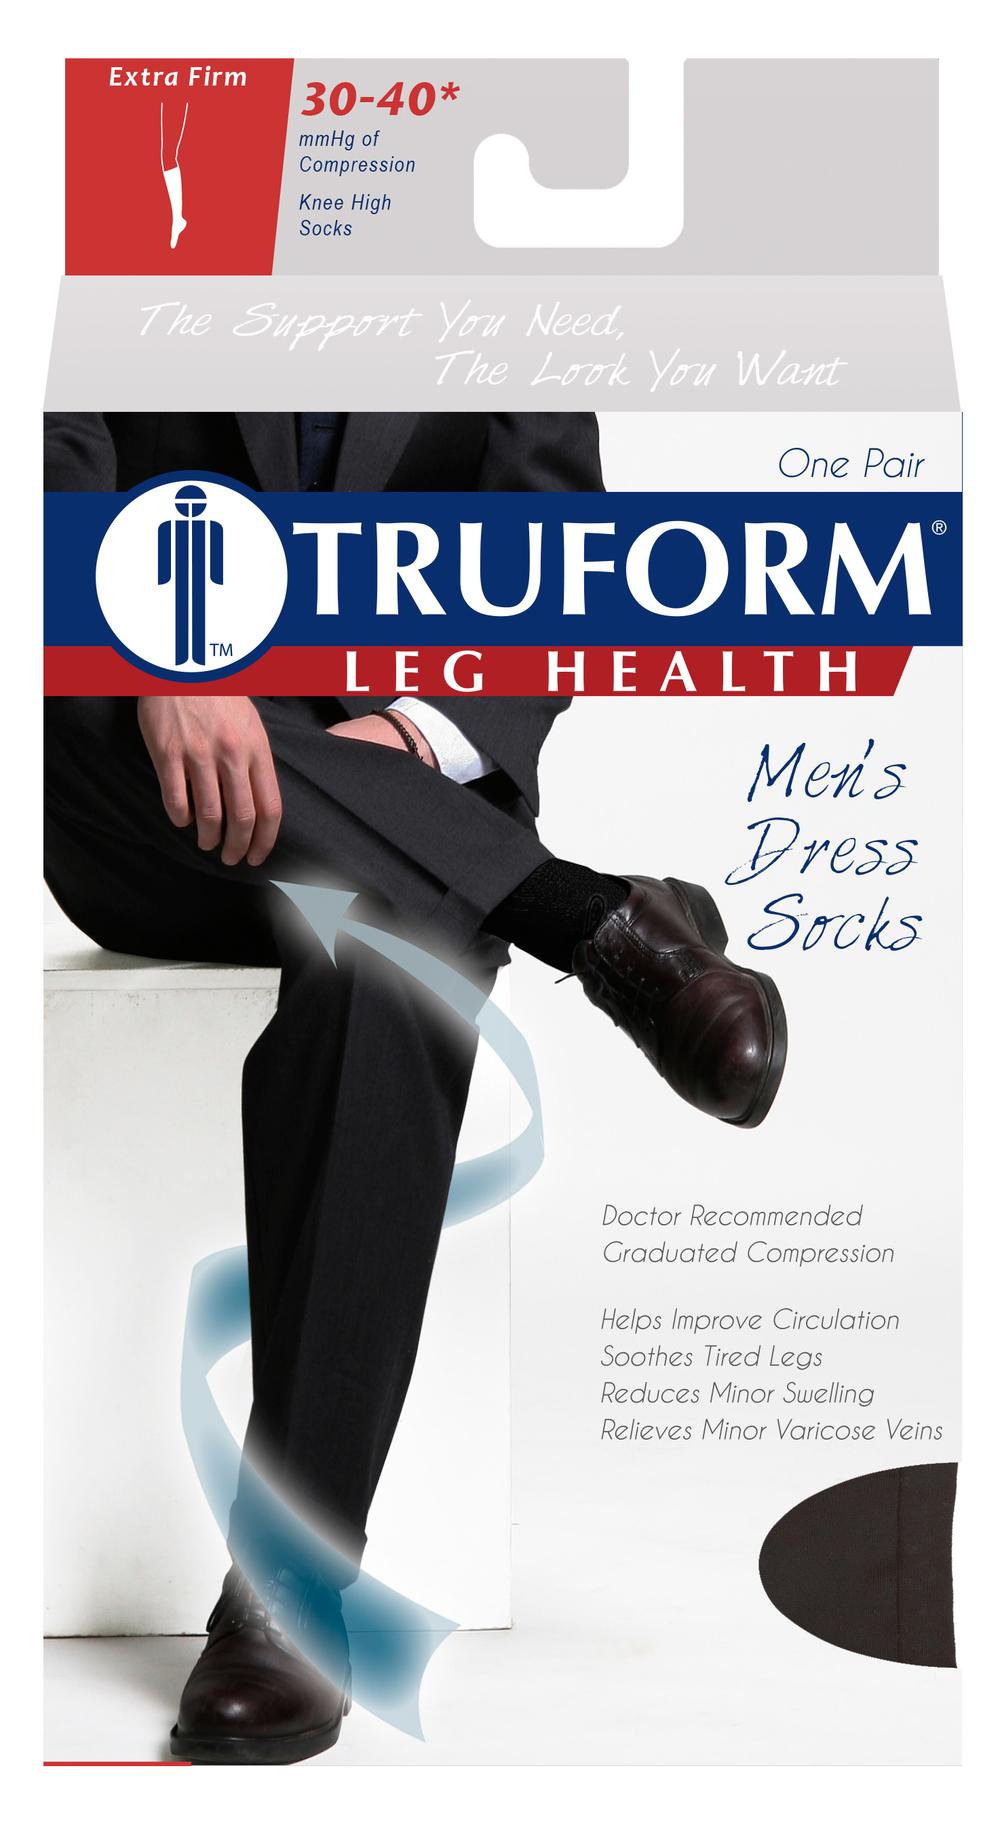 Truform, 1954, 30-40 mmHg, Compression, Men's, Knee High, Dress Sock, Package